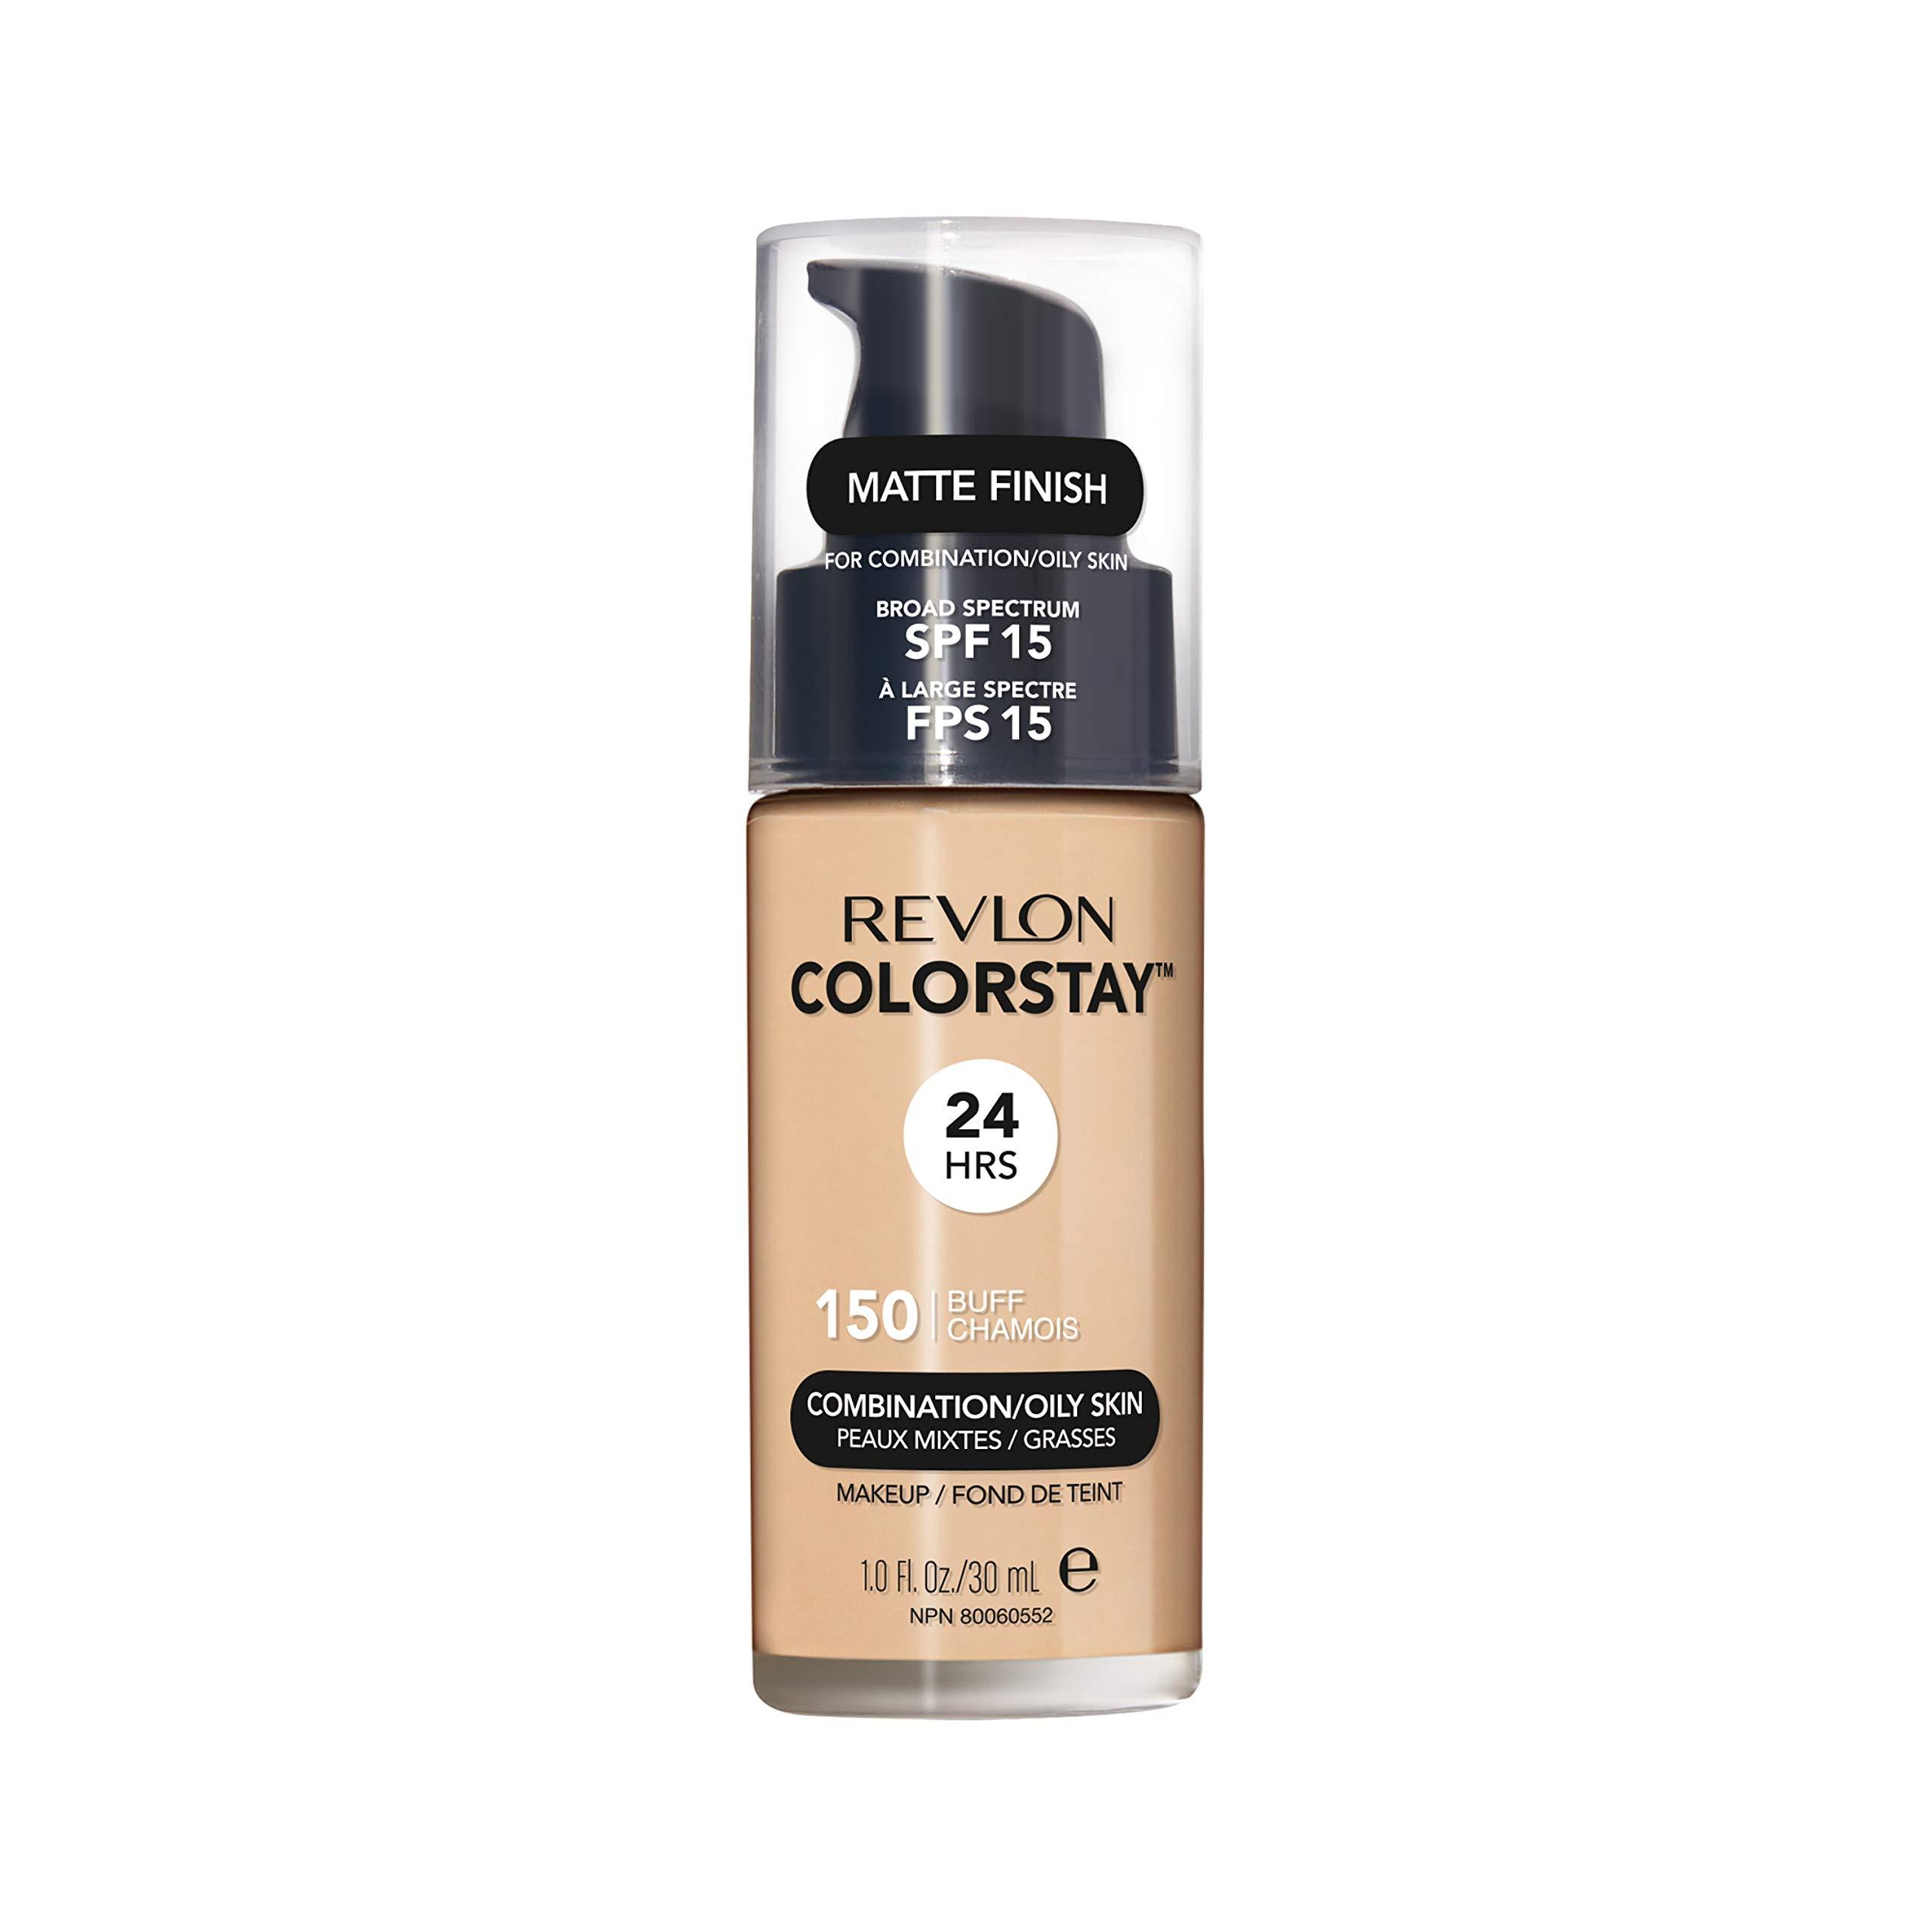 Revlon Colorstay Liquid Foundation Makeup for Combination/Oily Skin SPF 15, Longwear Medium-Full Coverage with Matte Finish, Buff (150), 30 ml